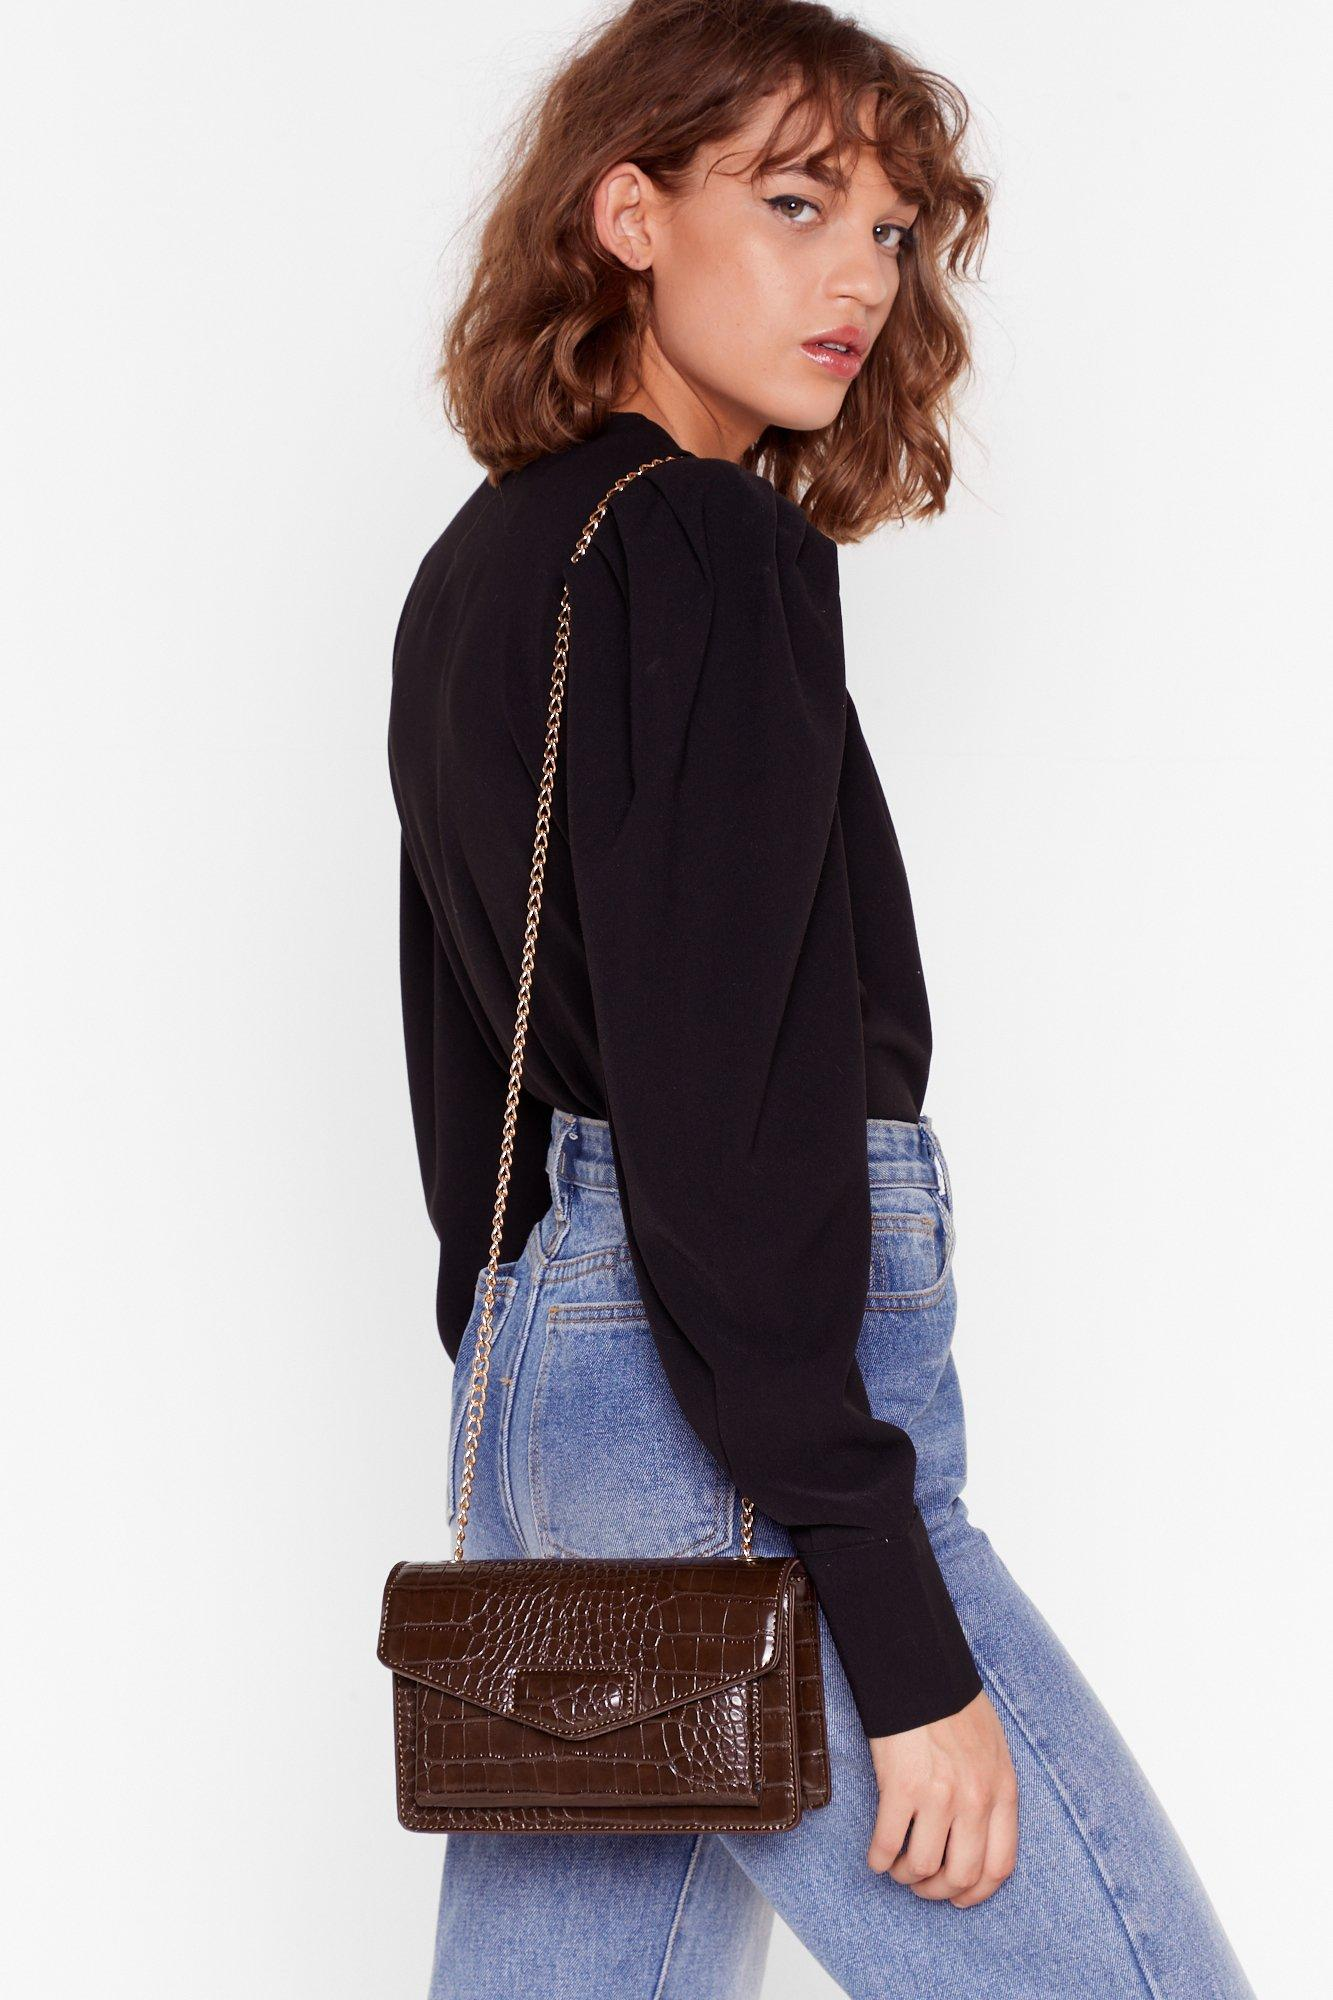 Faux Croc Chain Strap Corssbody Bag by Nasty Gal